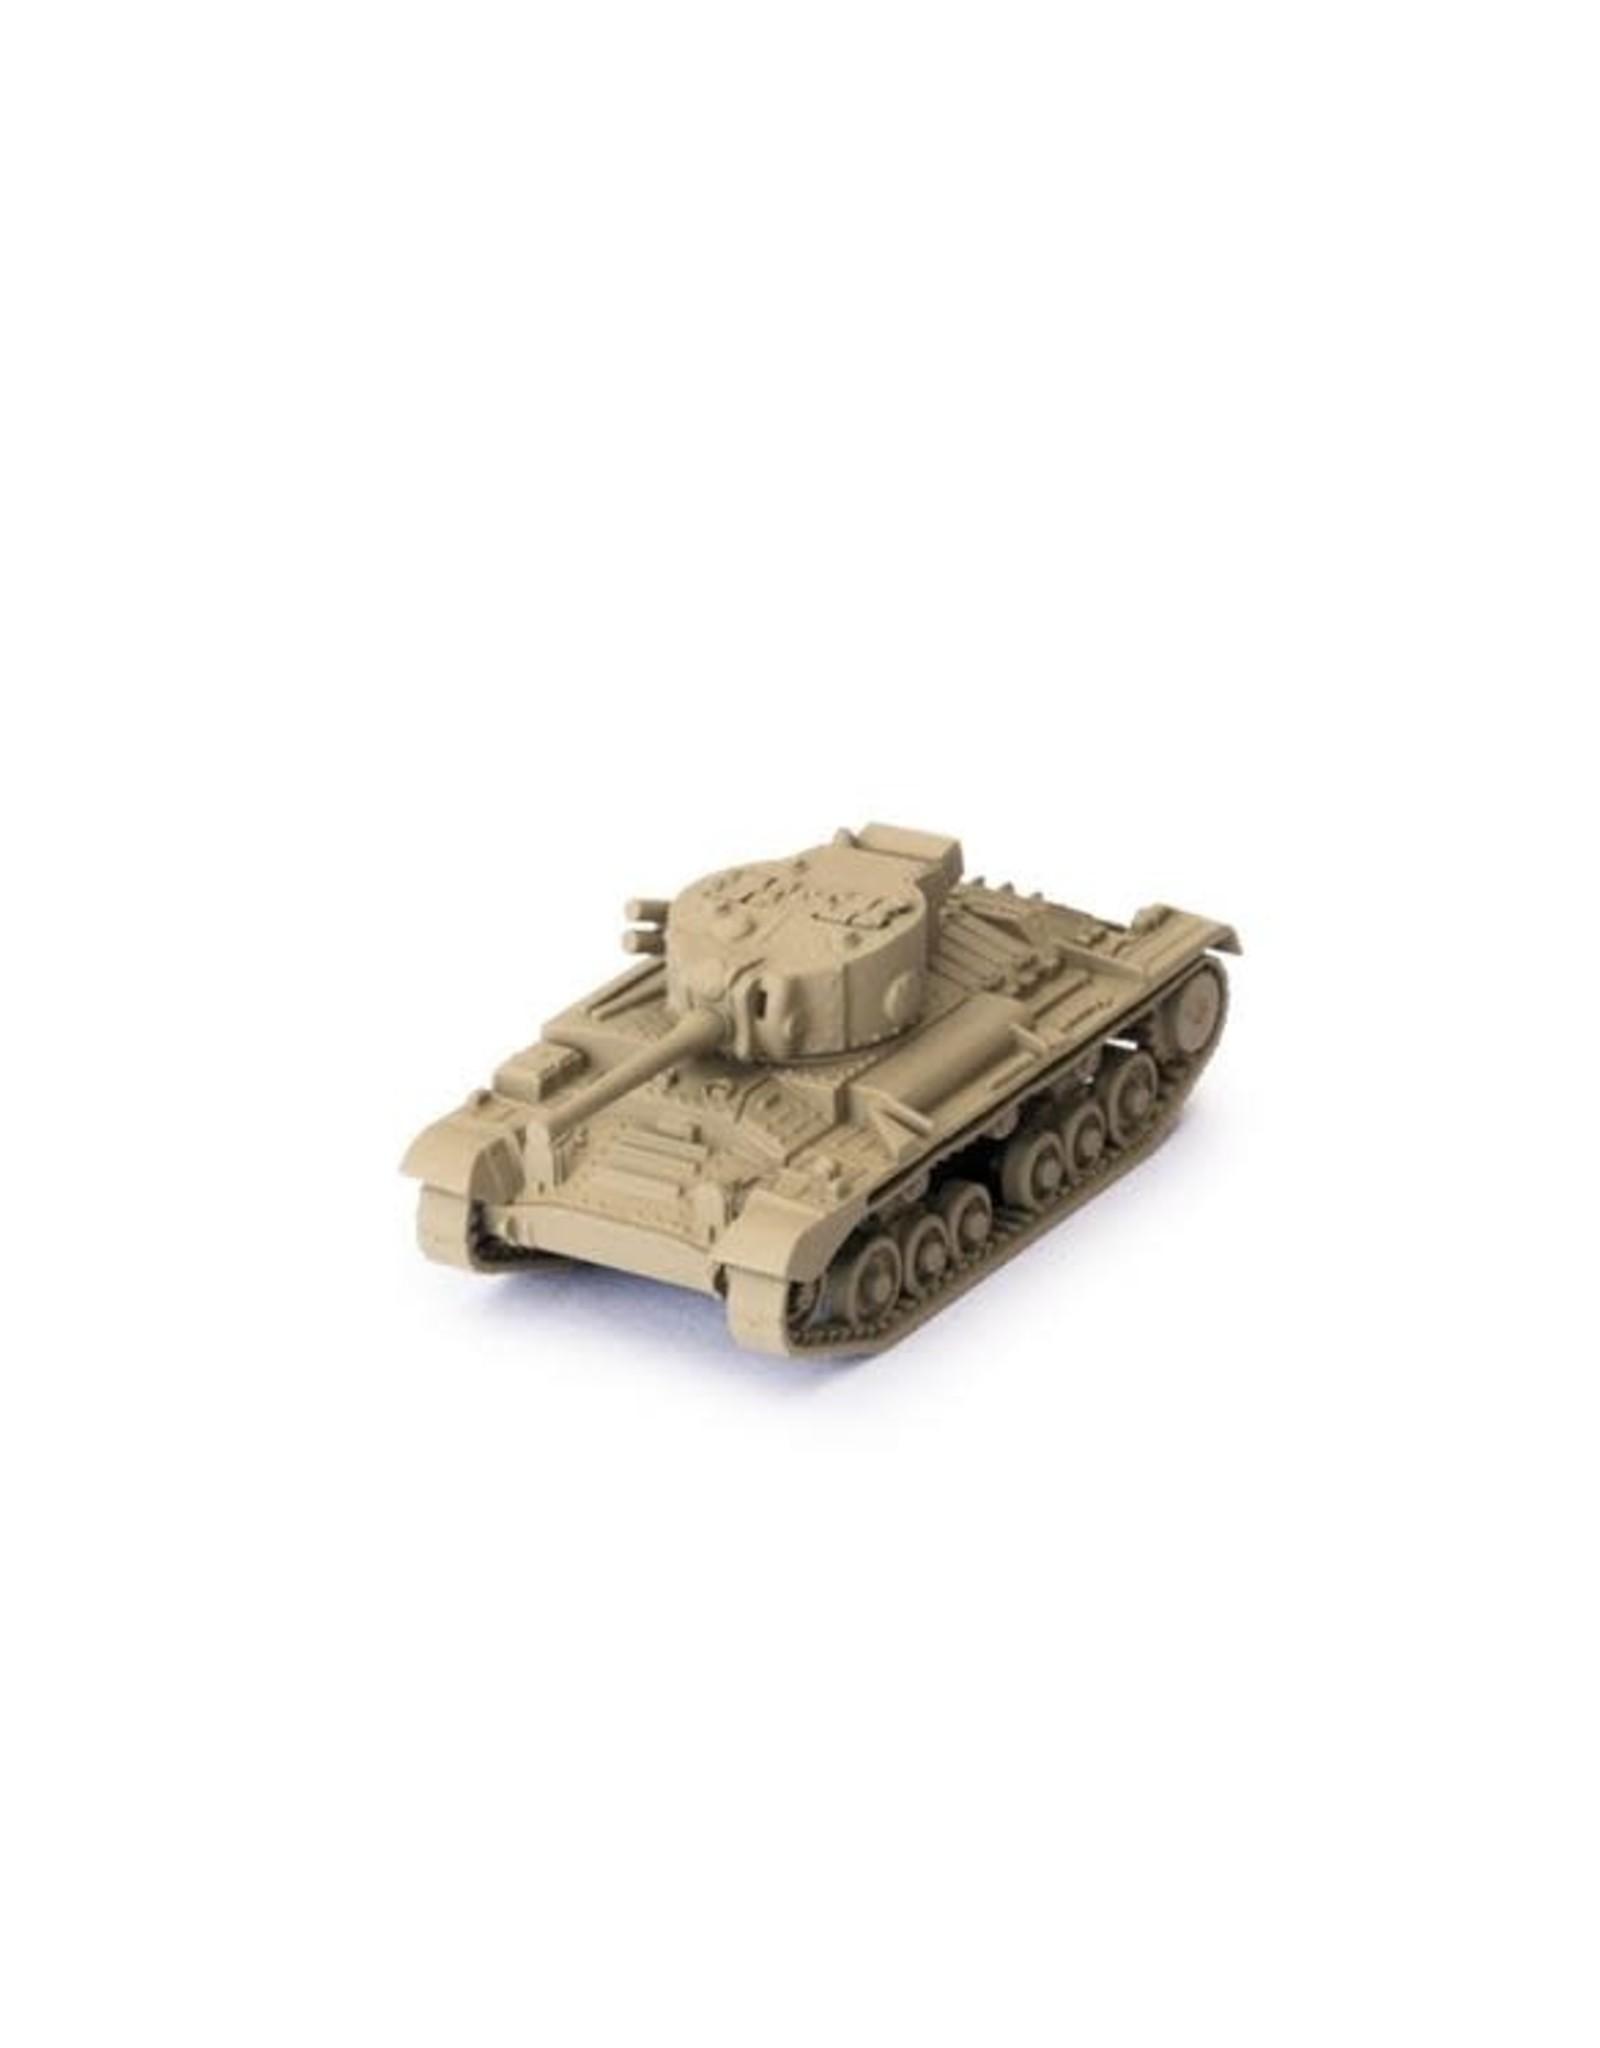 GaleForce nine World of Tanks Expansion - British (Valentine)